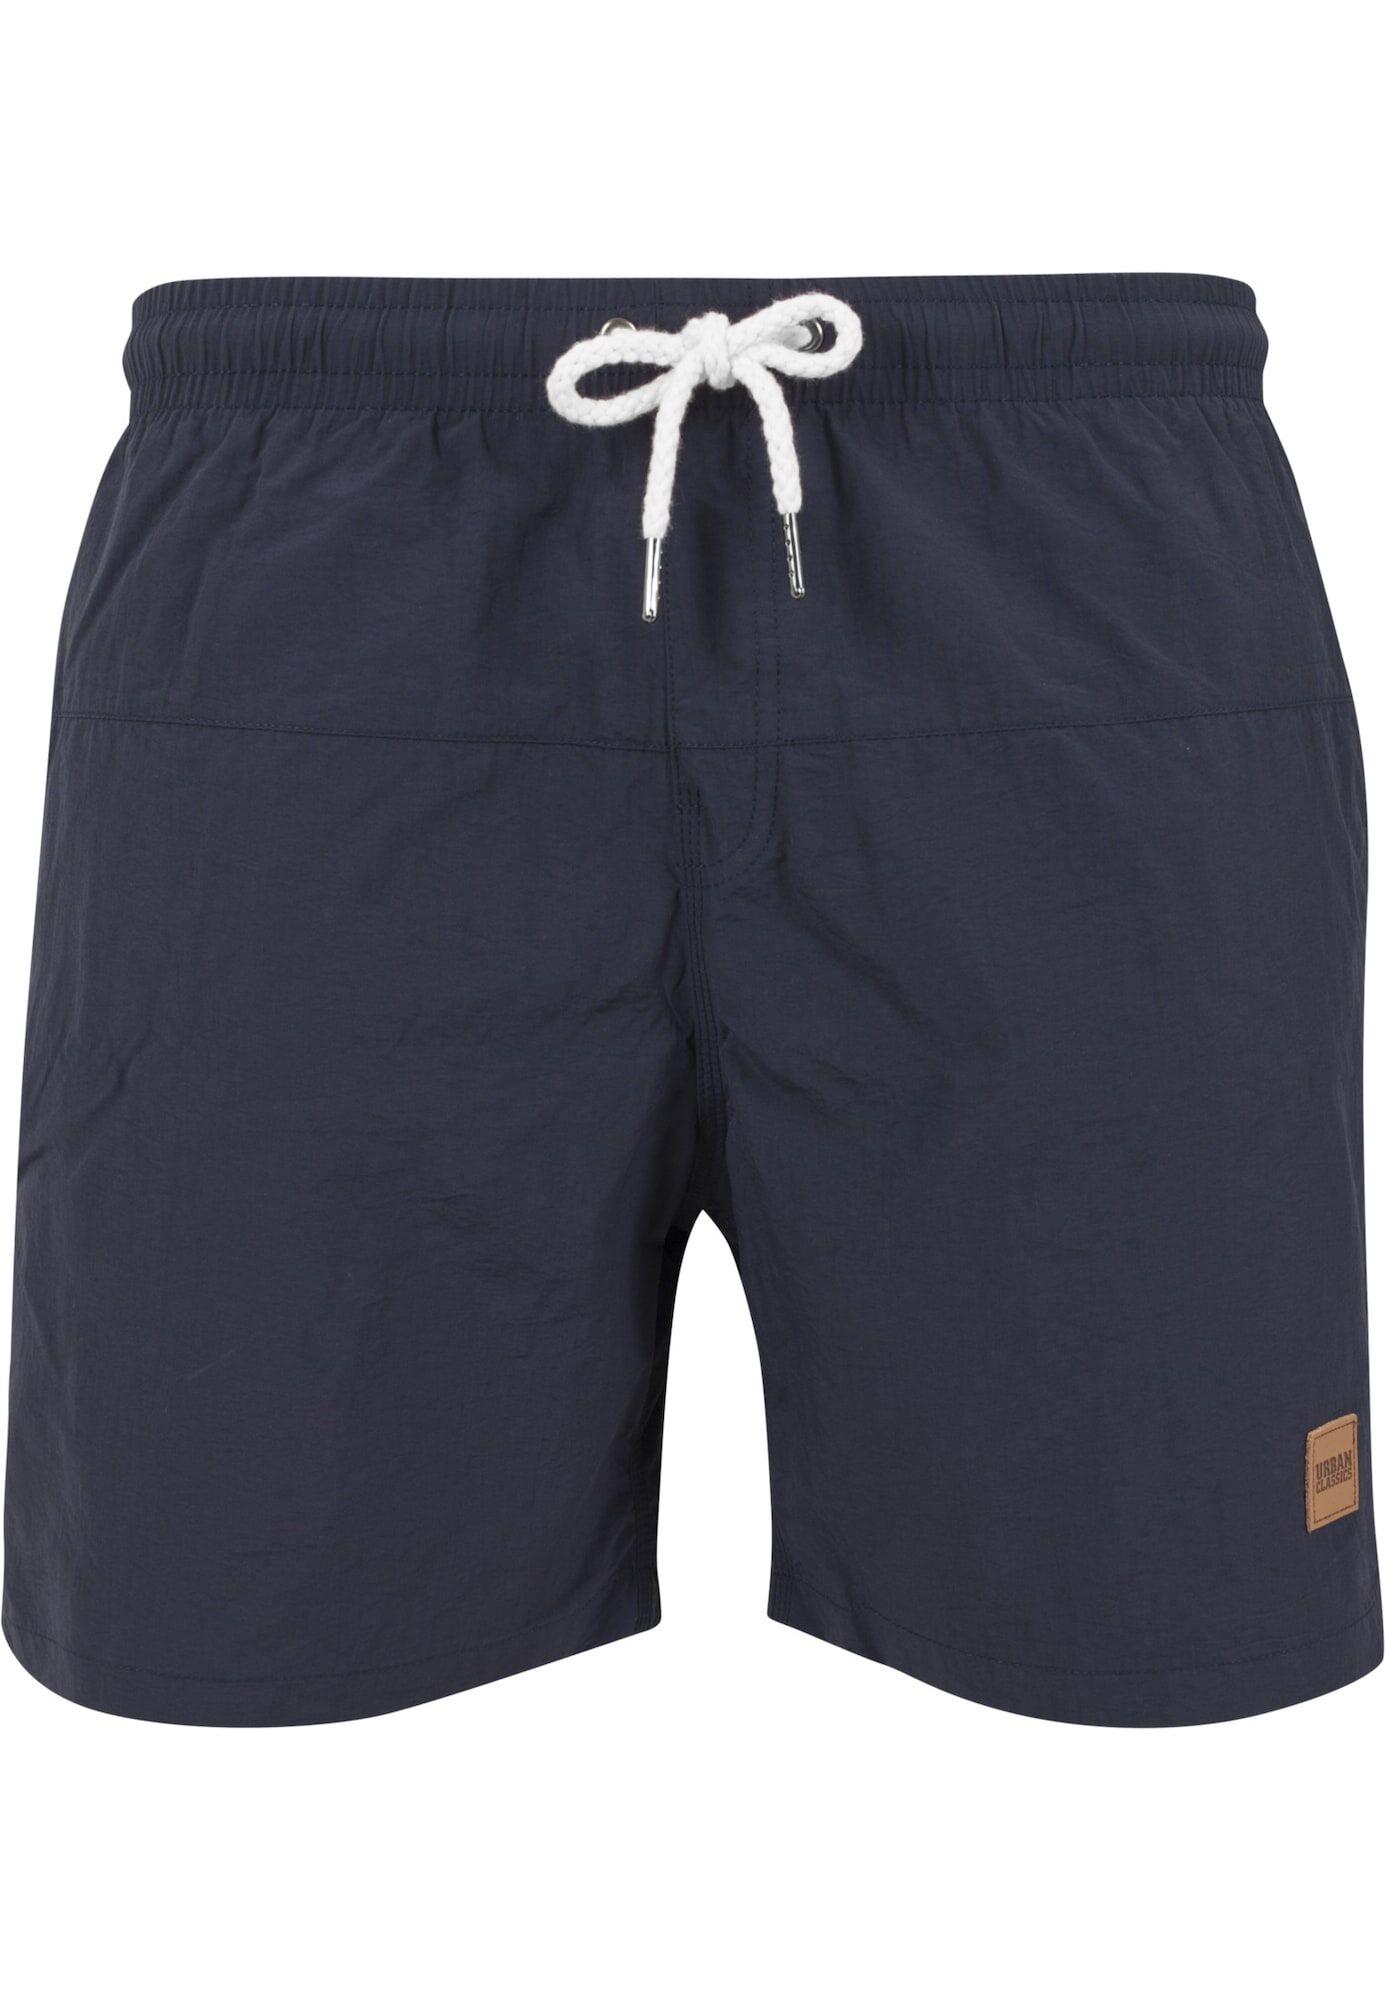 Urban Classics Shorts de bain  - Bleu - Taille: XS - male